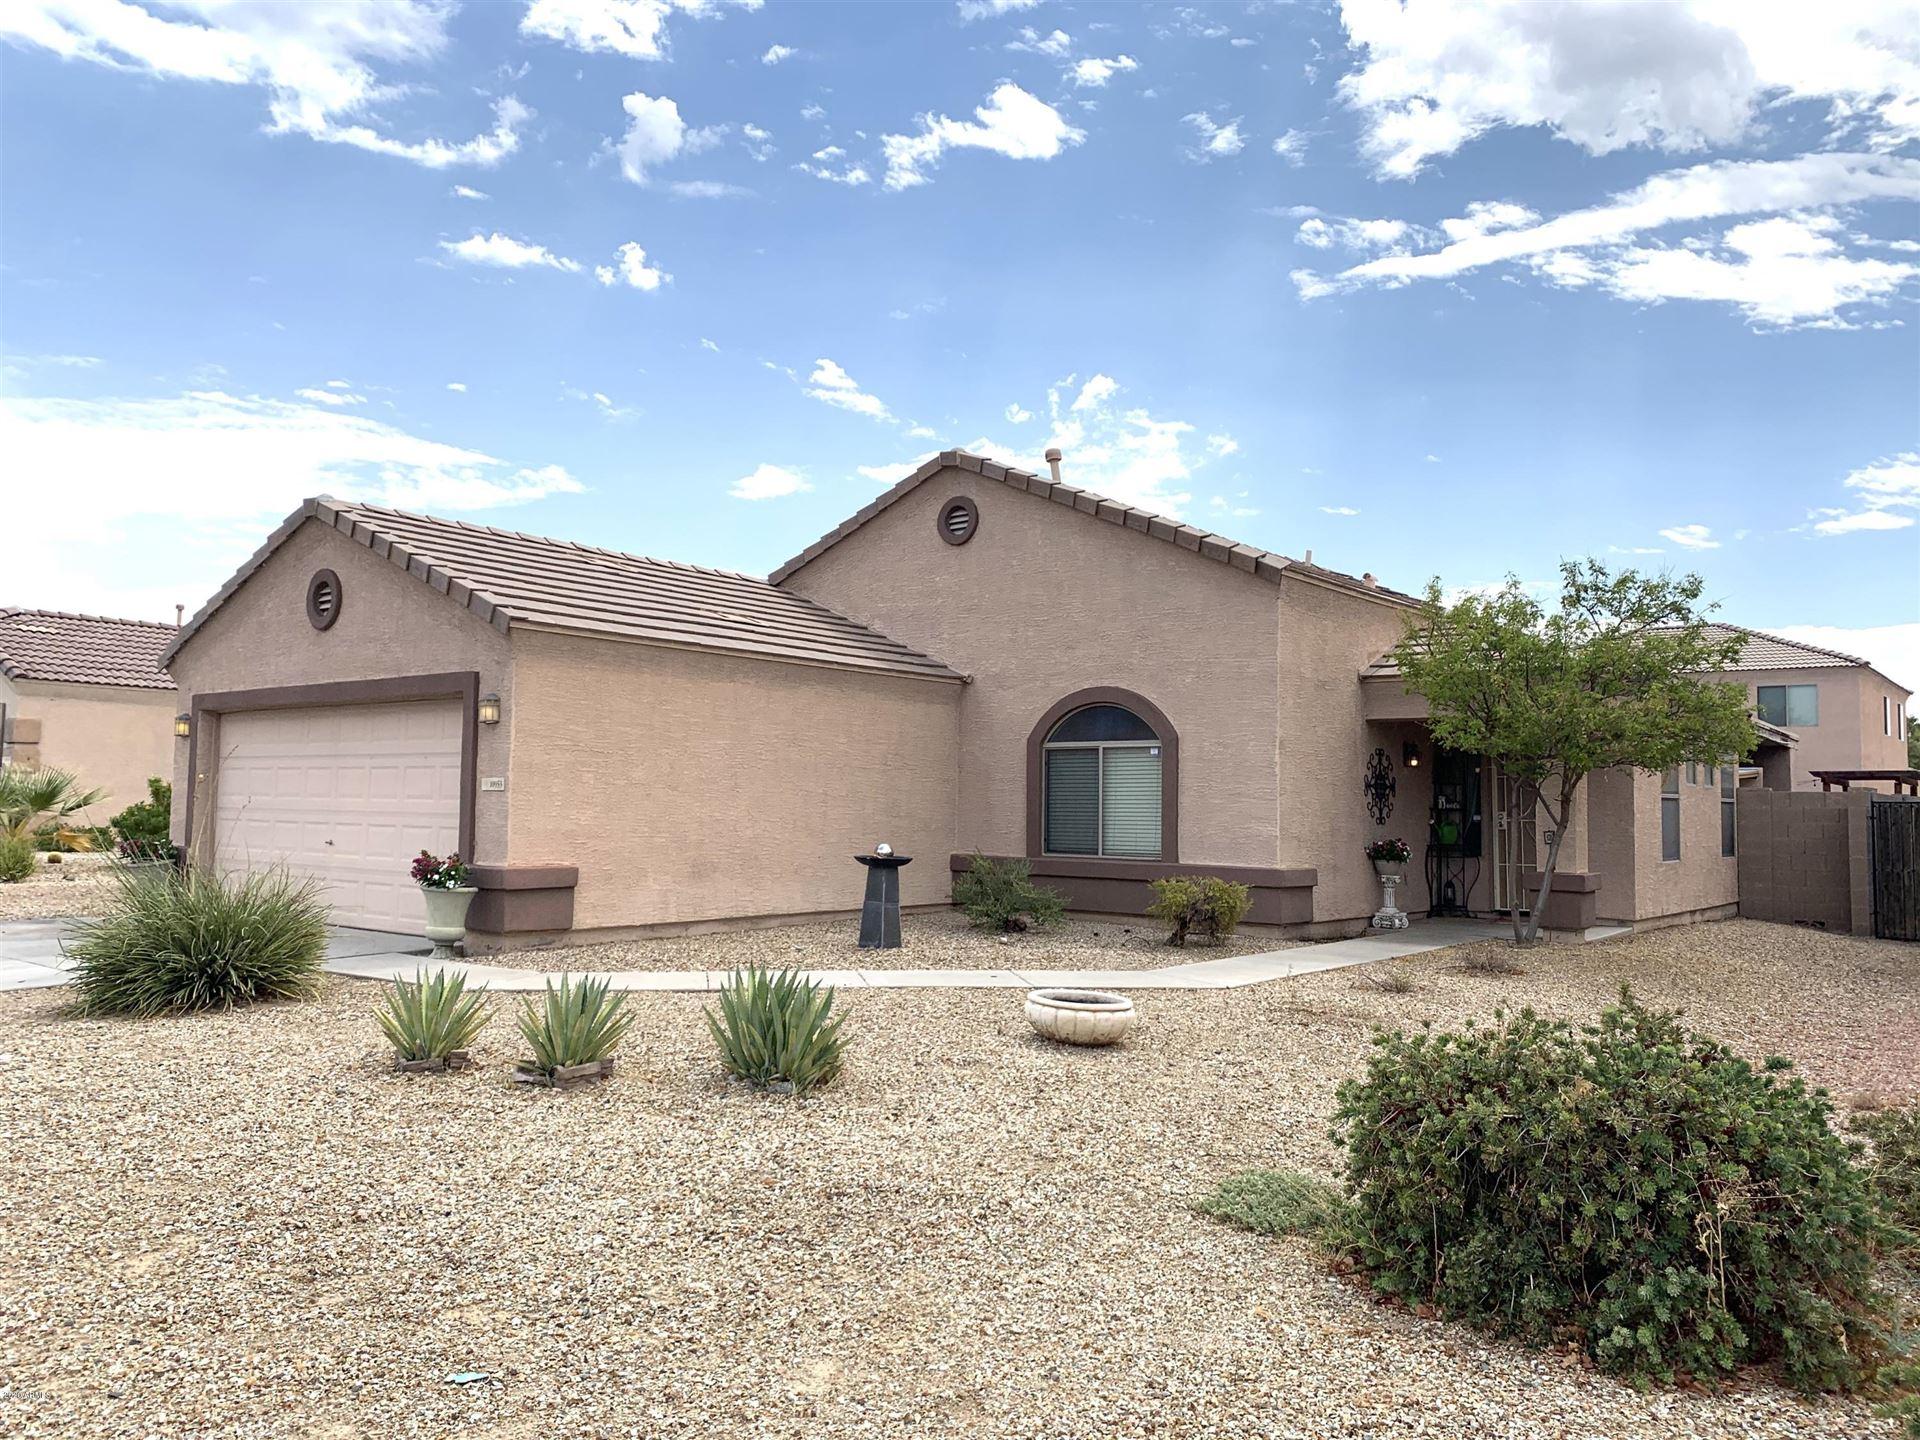 10953 W ROYAL PALM Road, Peoria, AZ 85345 - MLS#: 6123236